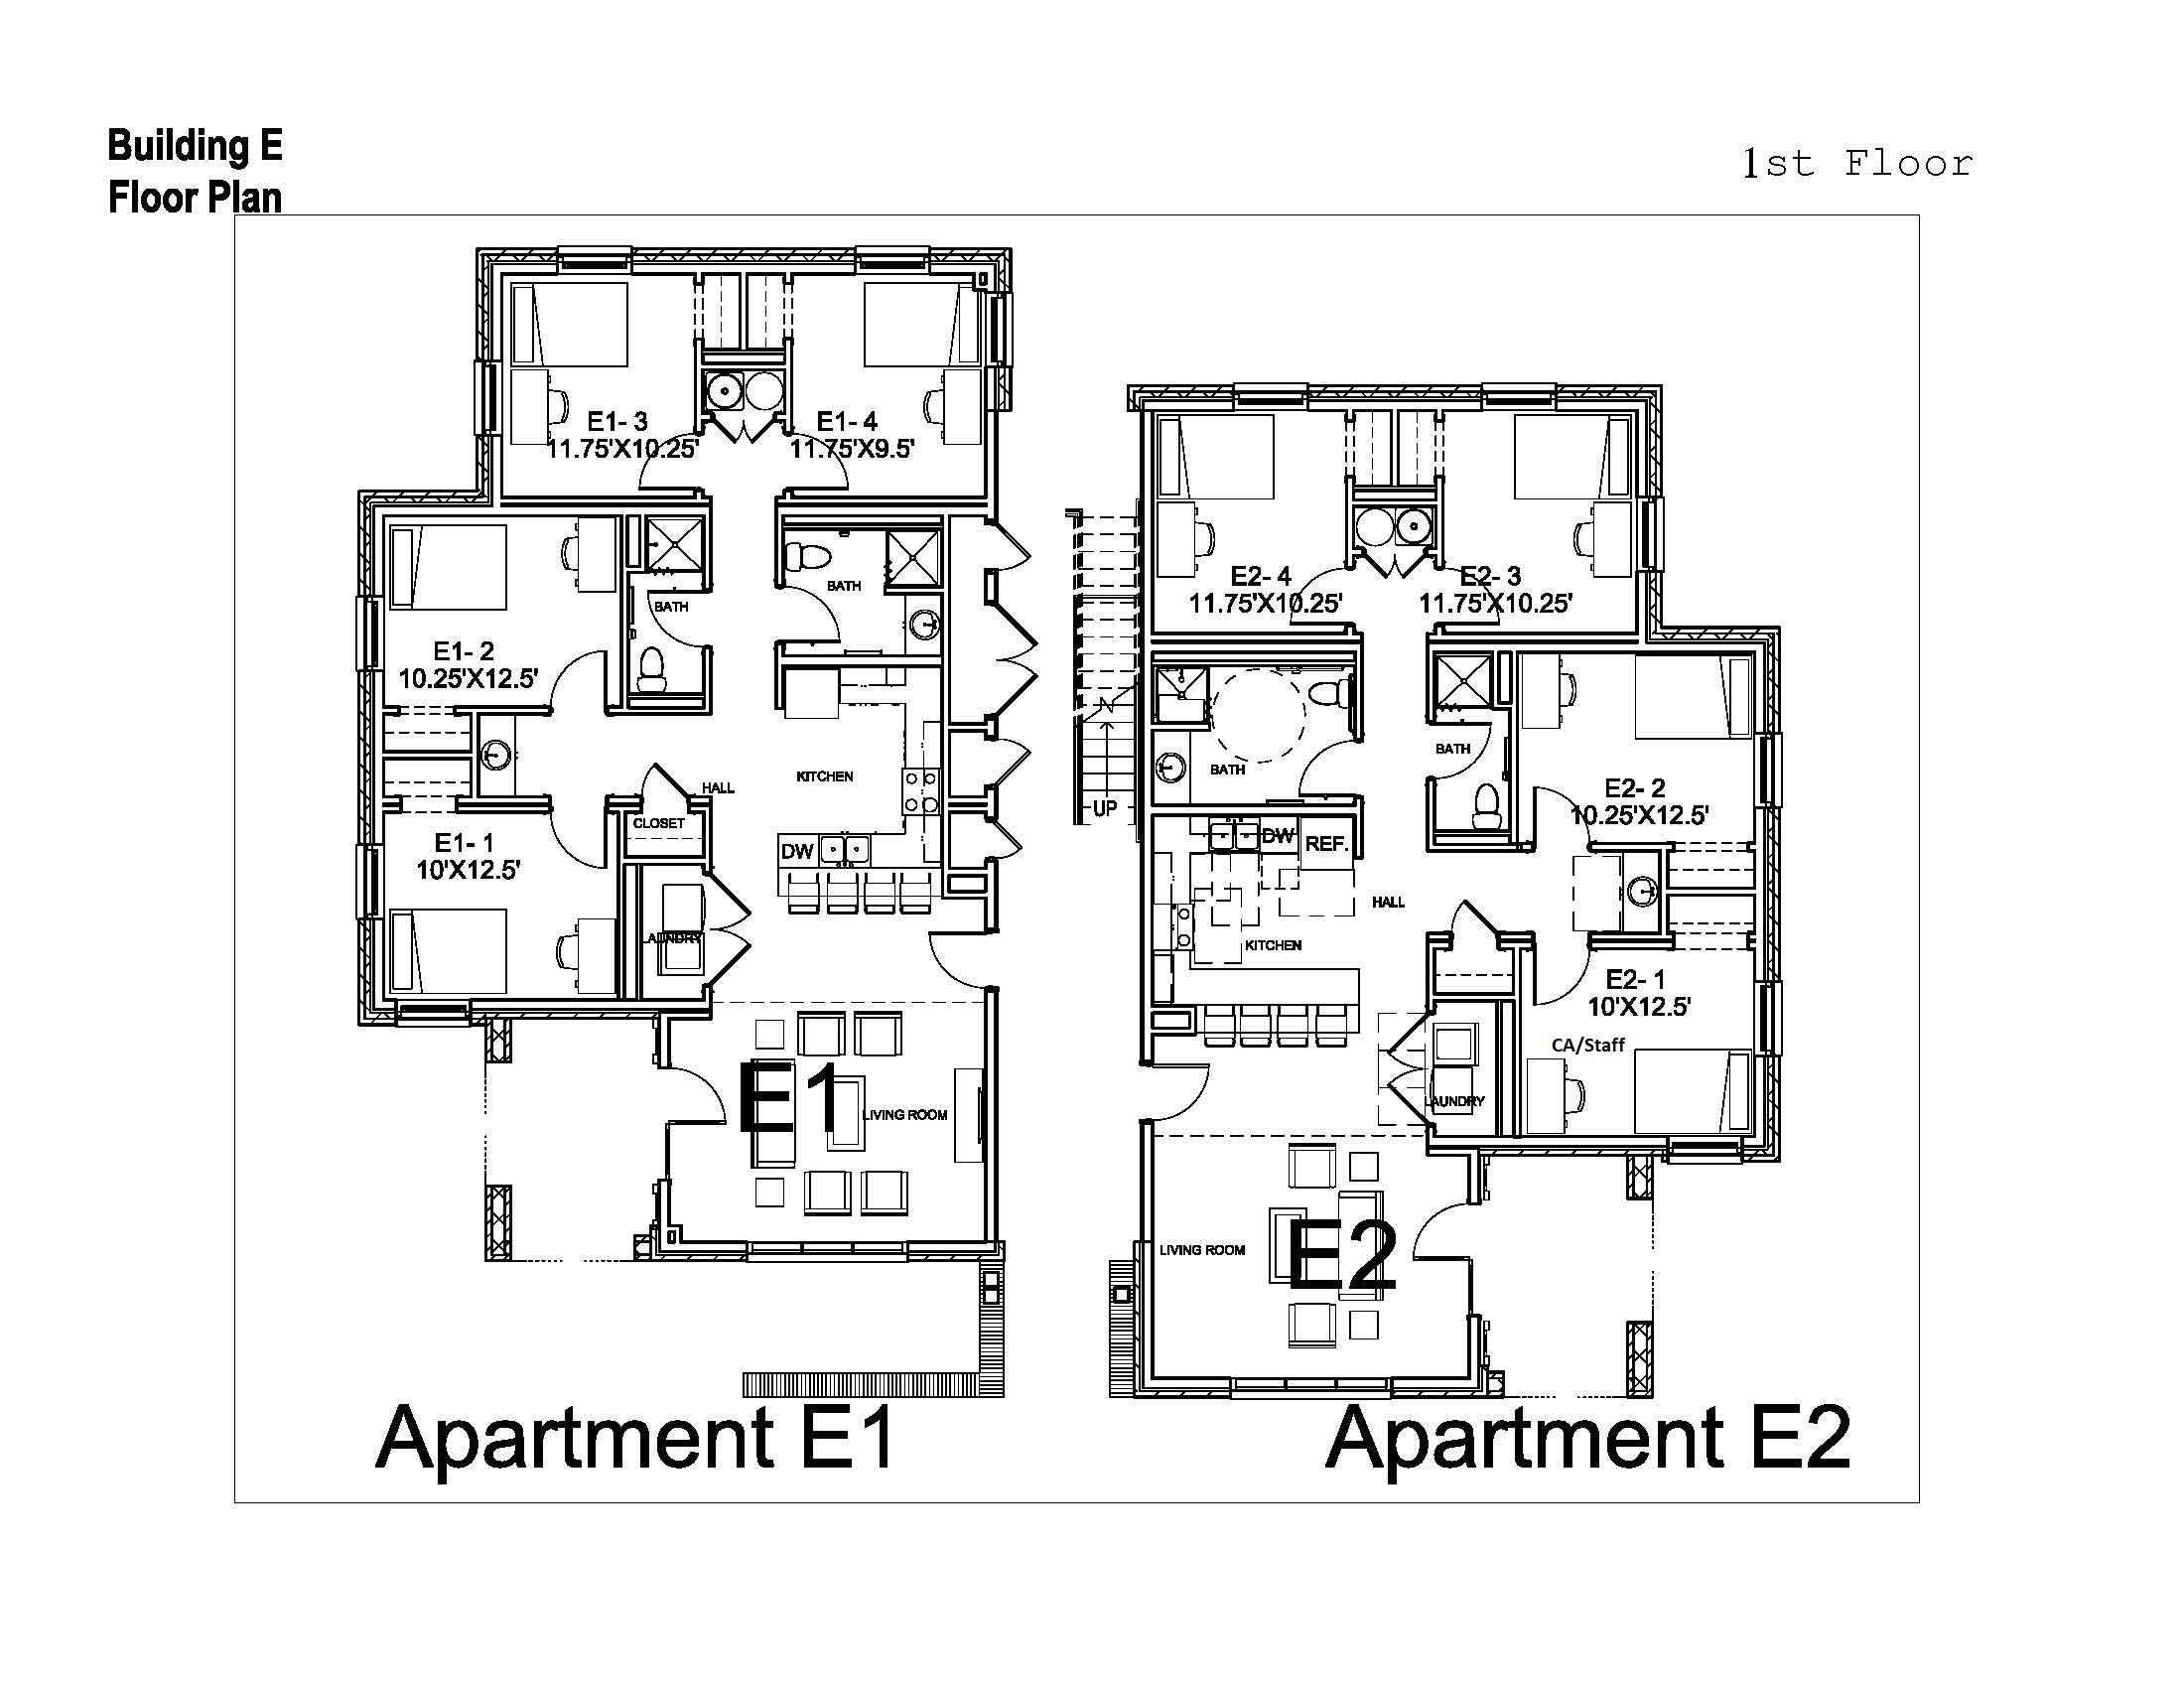 Village Apartments : Washington and Lee University